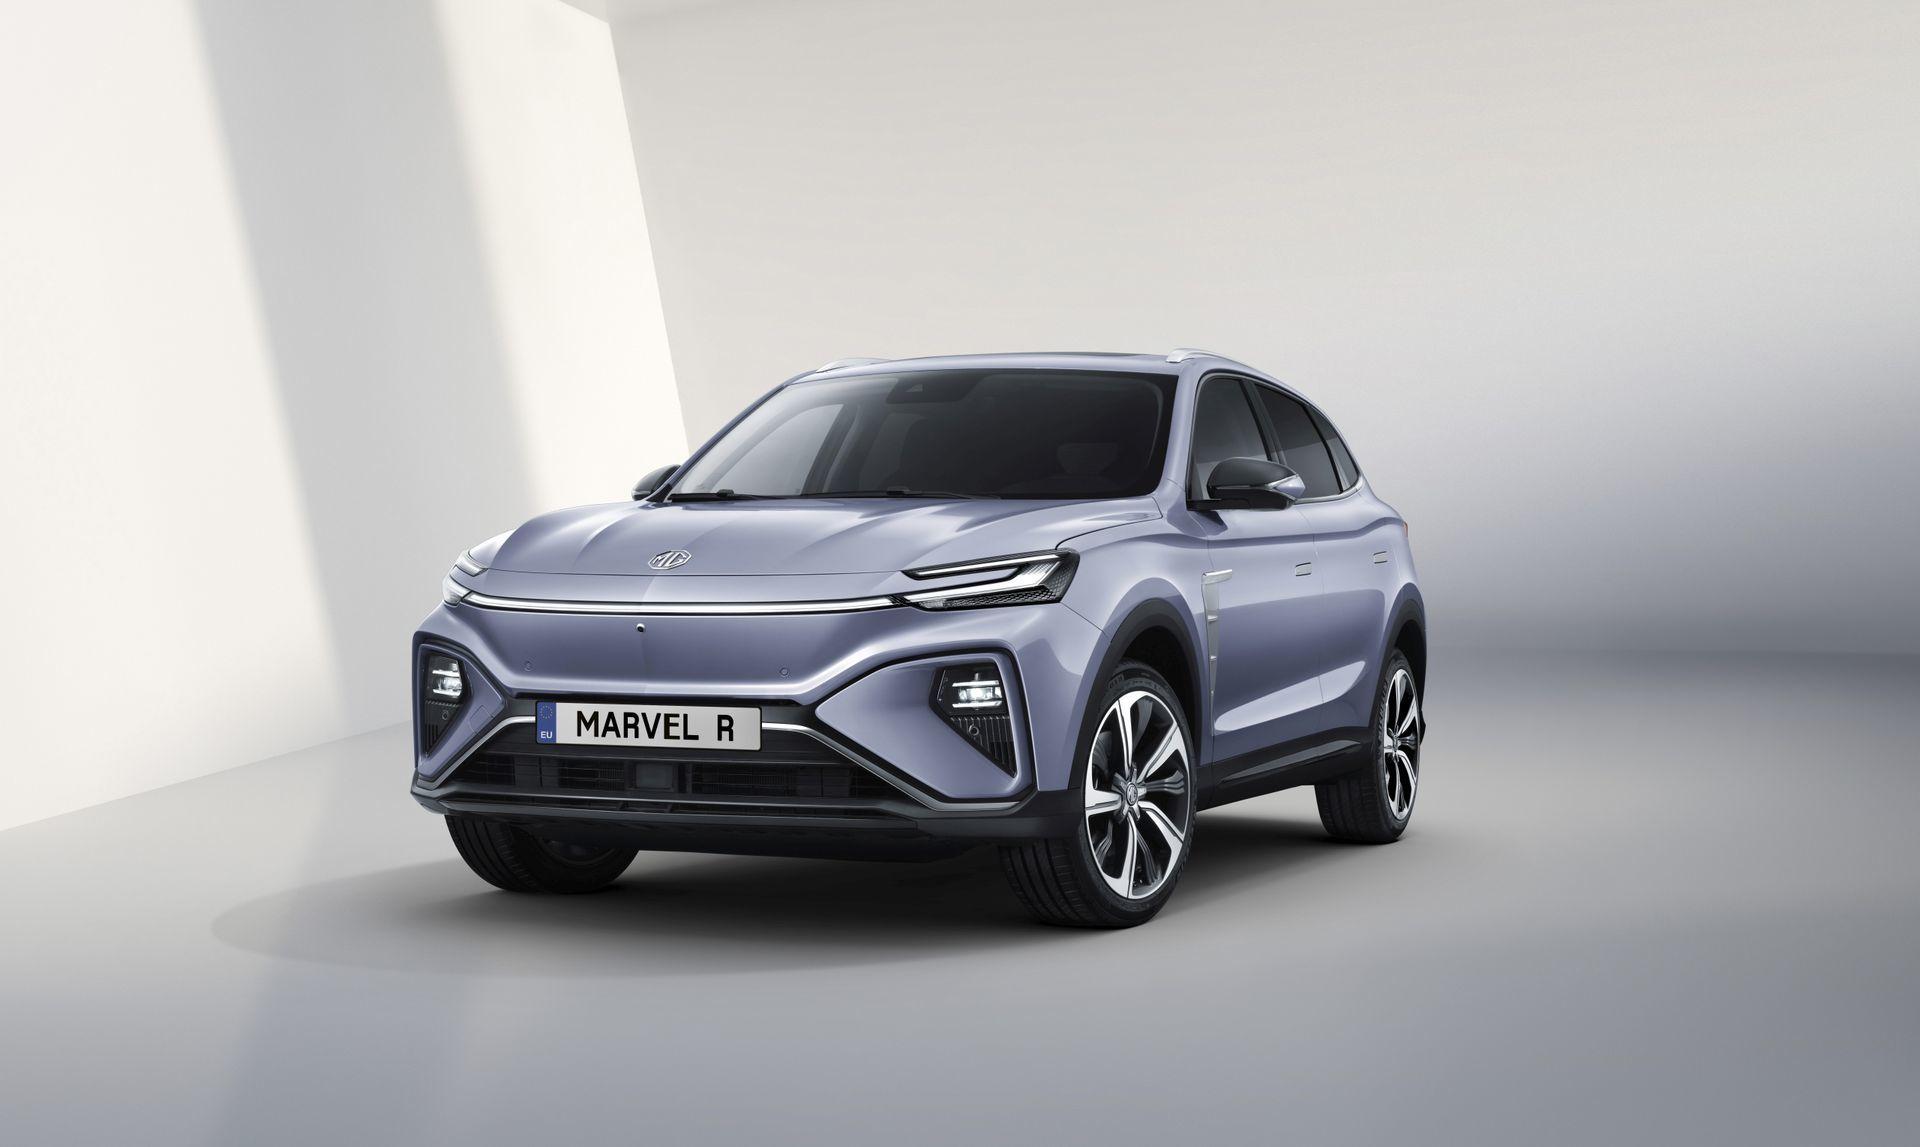 Mg Marvel R Electric 2021 5